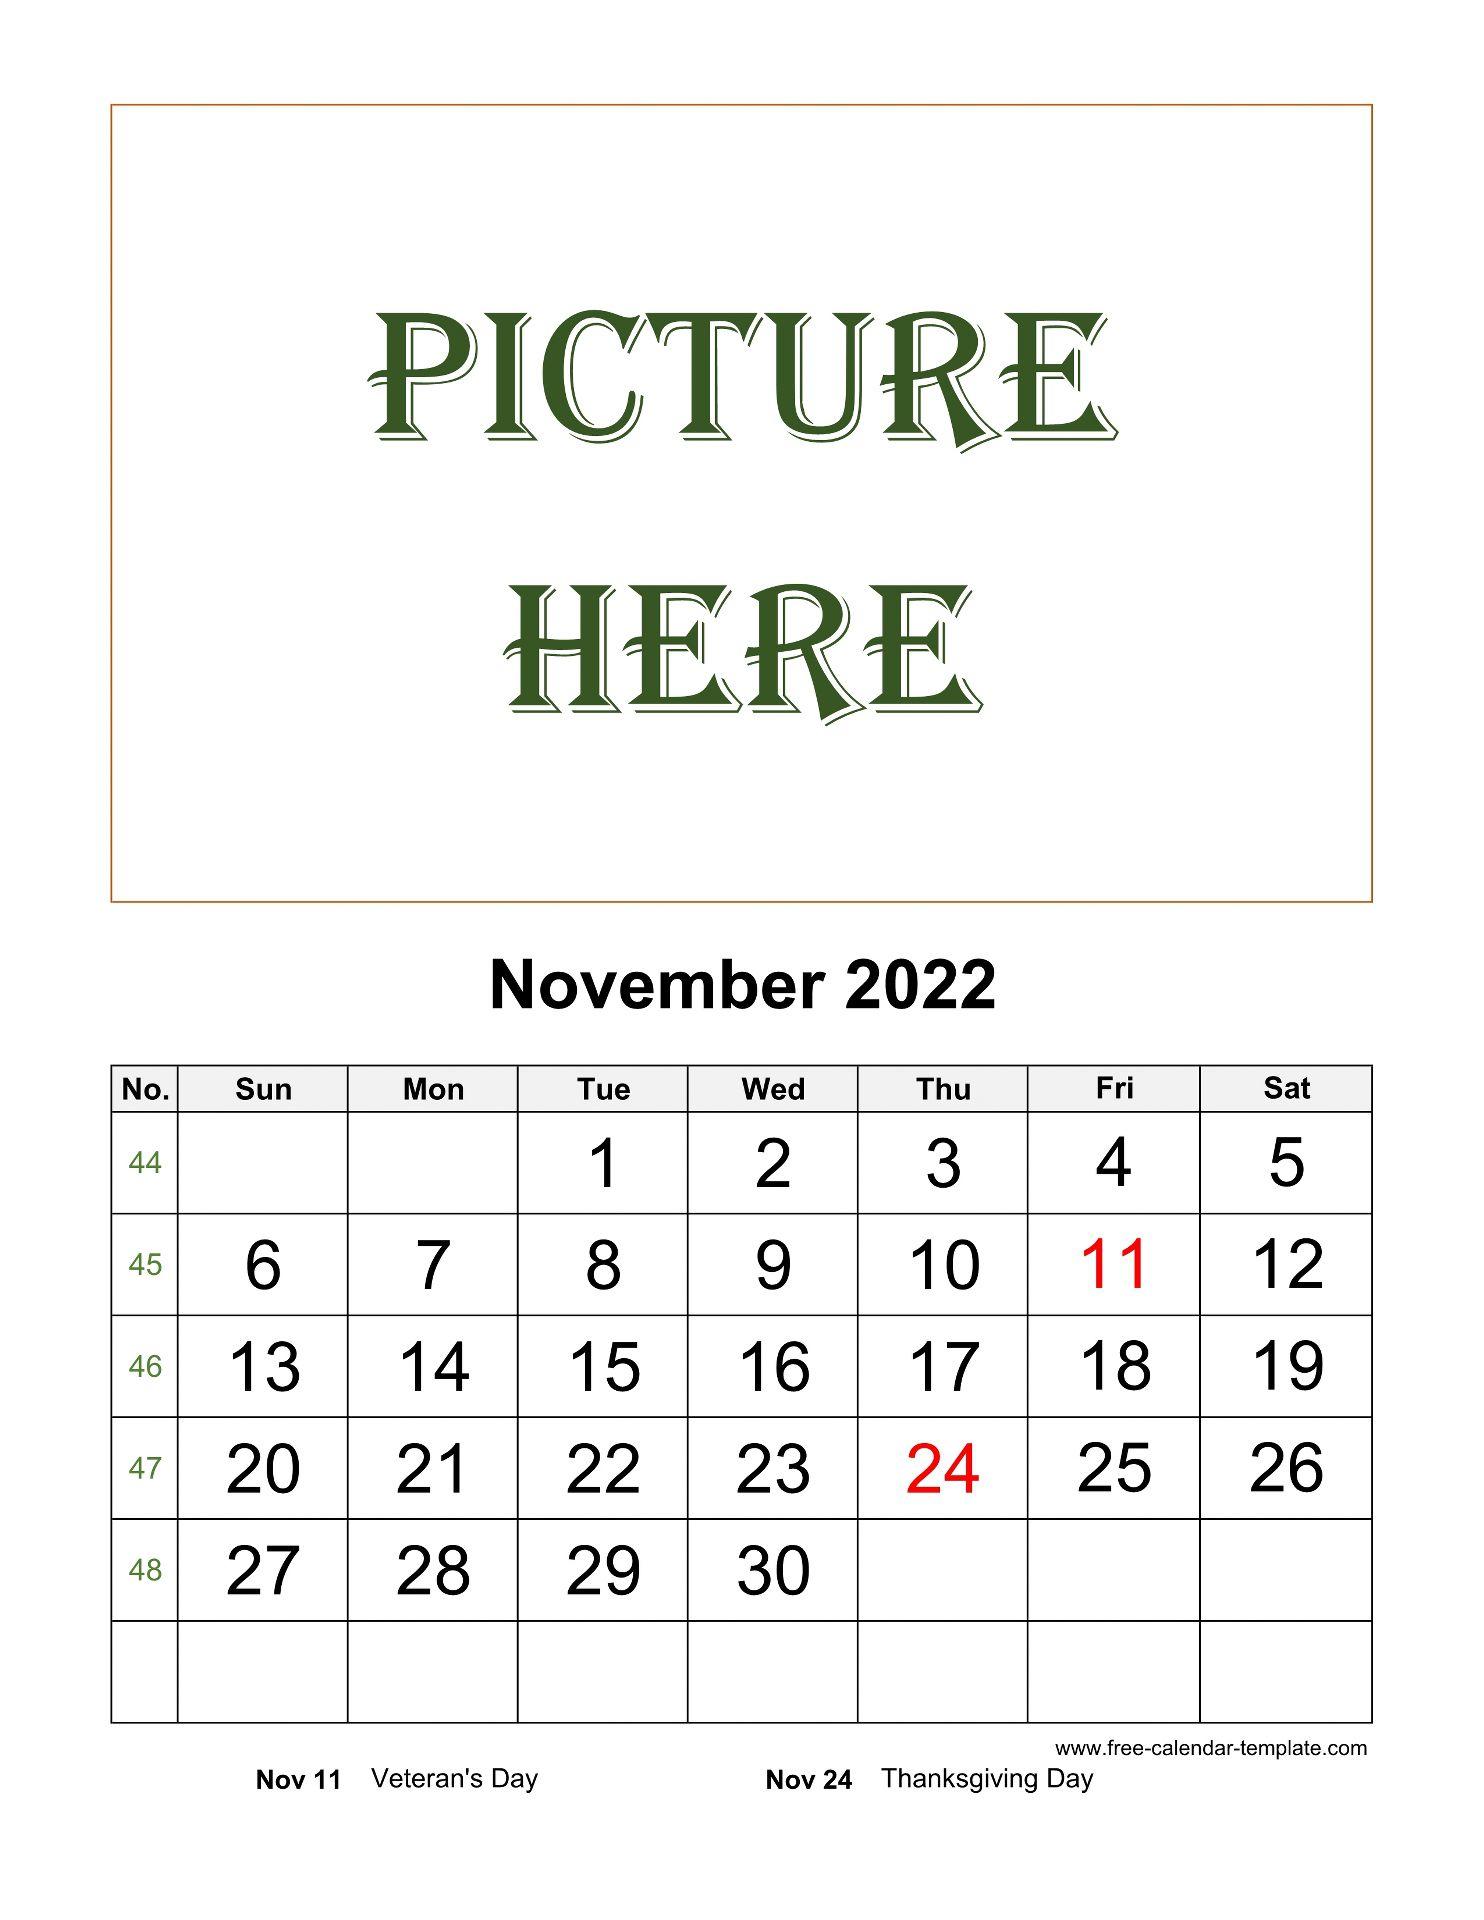 Printable Calendar 2022 November.November Printable 2022 Calendar Space For Add Picture Vertical Free Calendar Template Com